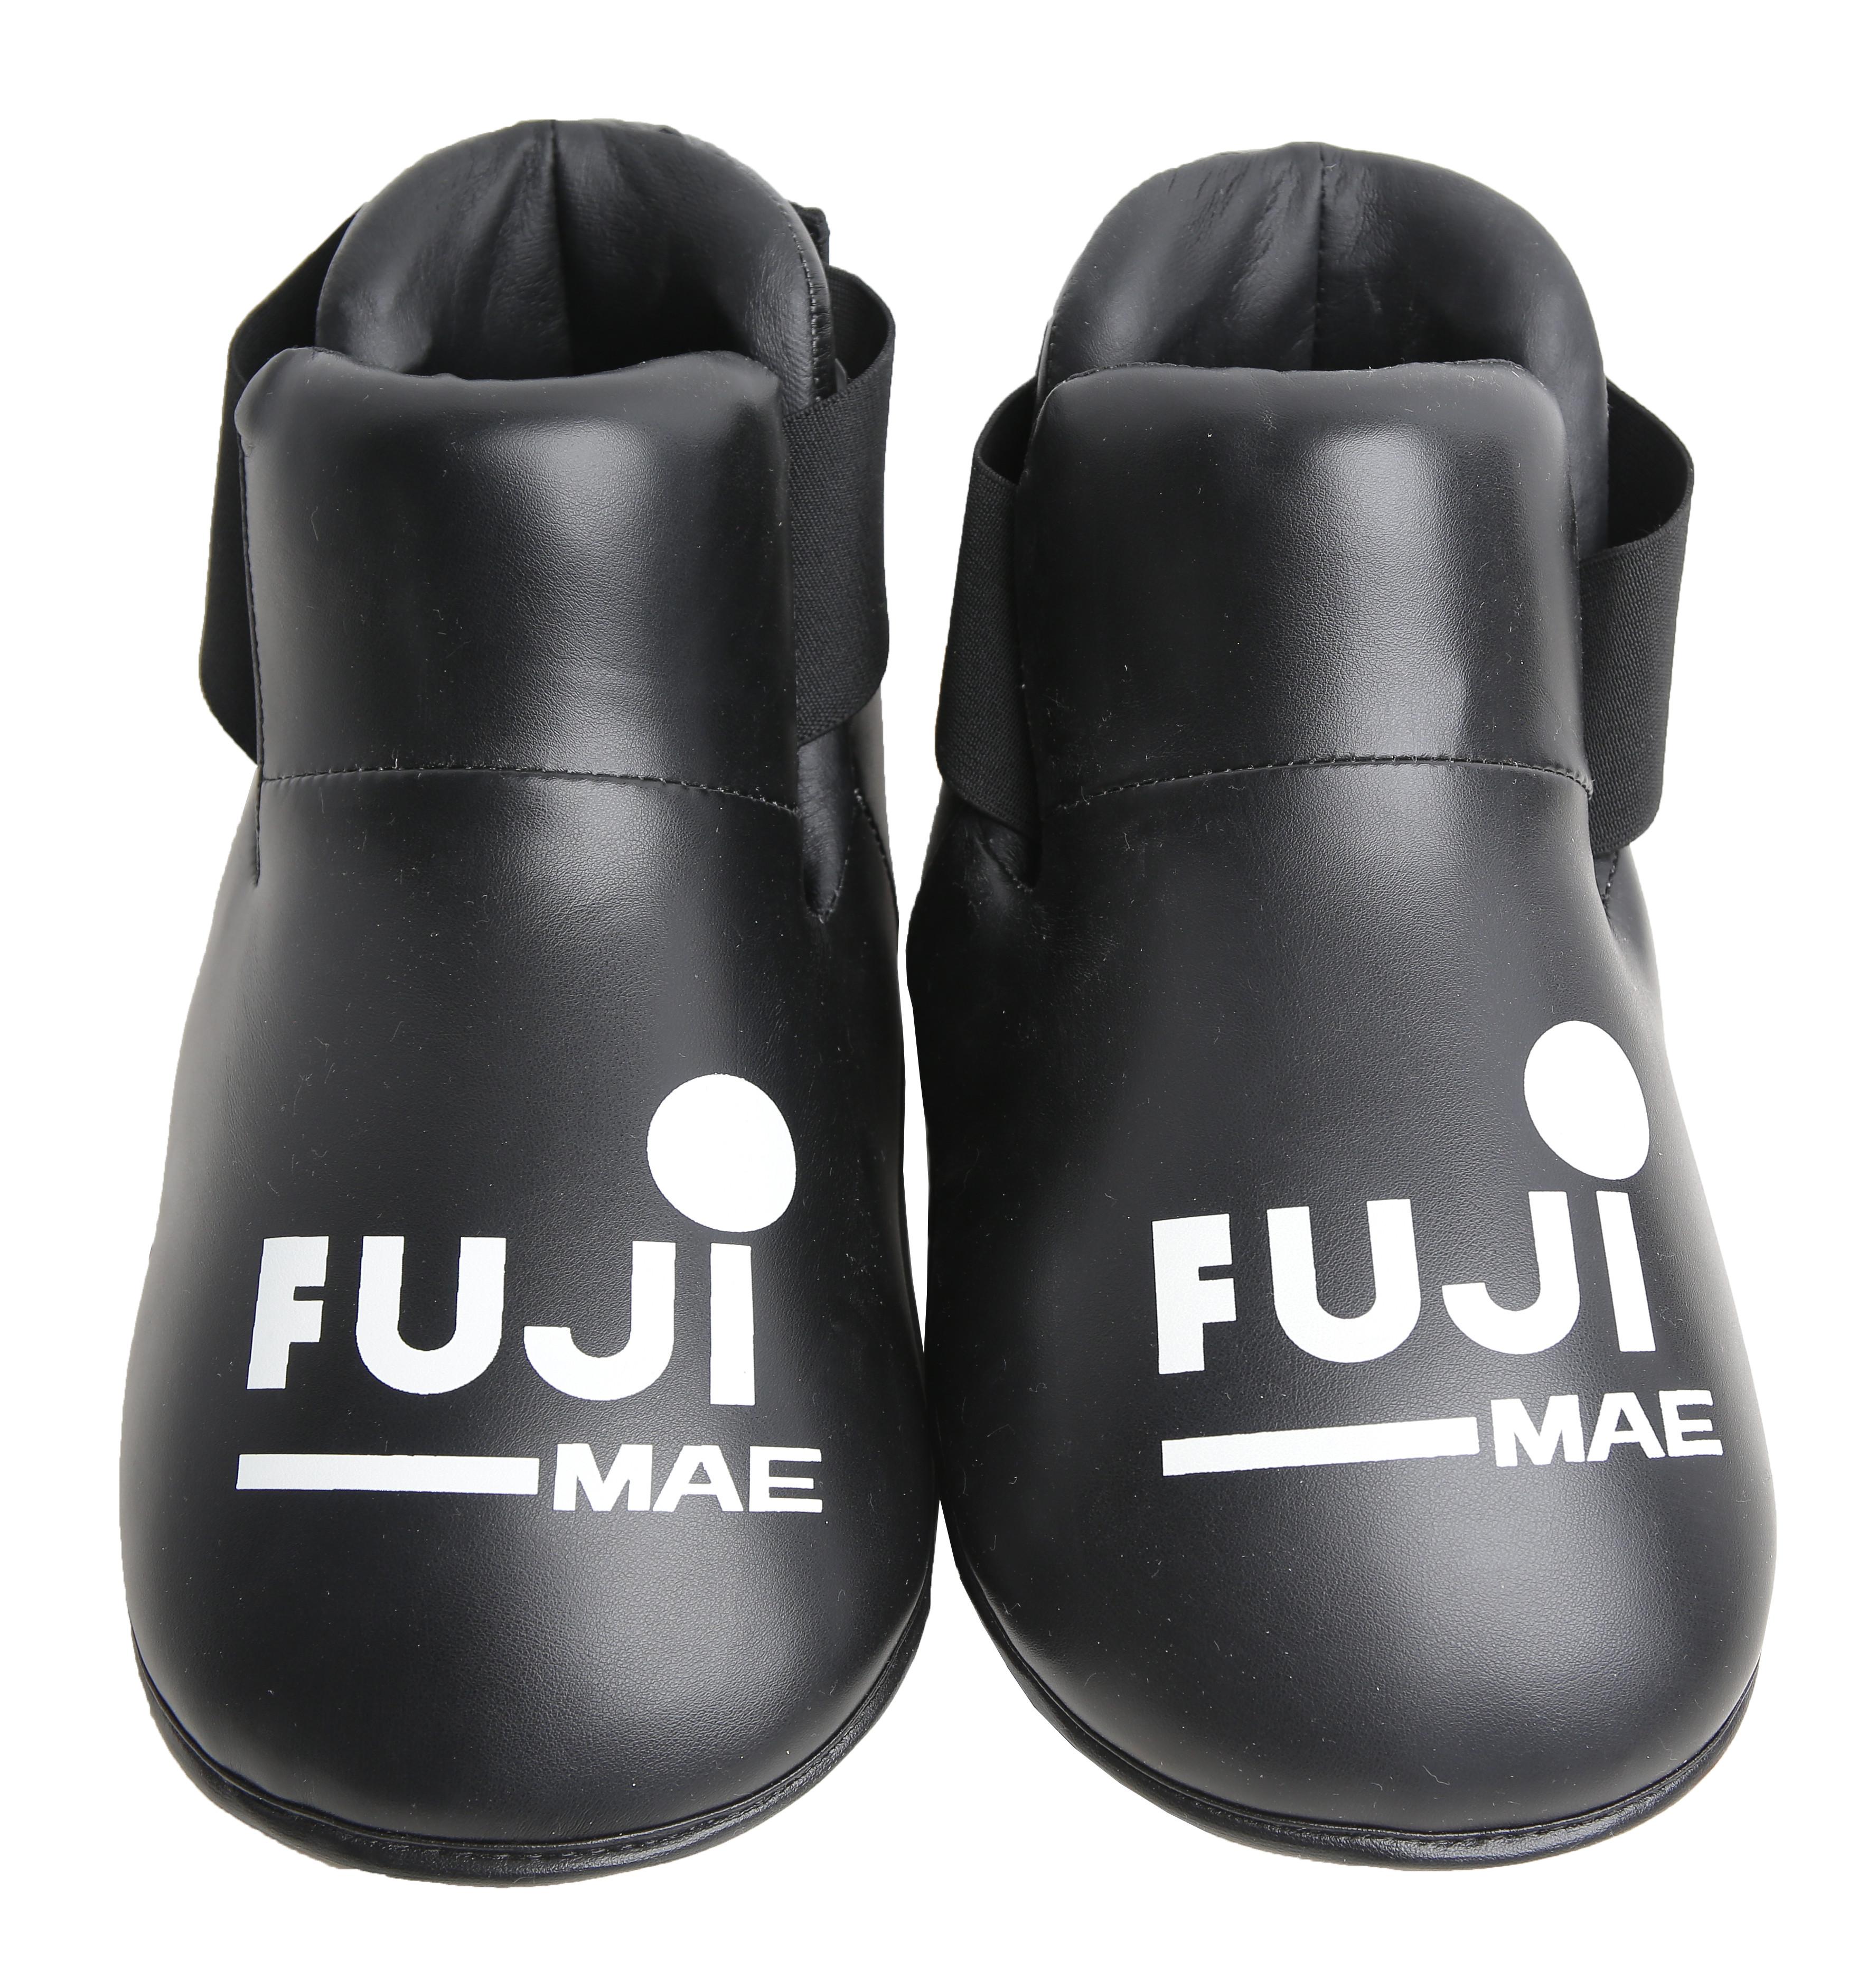 Футы fuji mae black